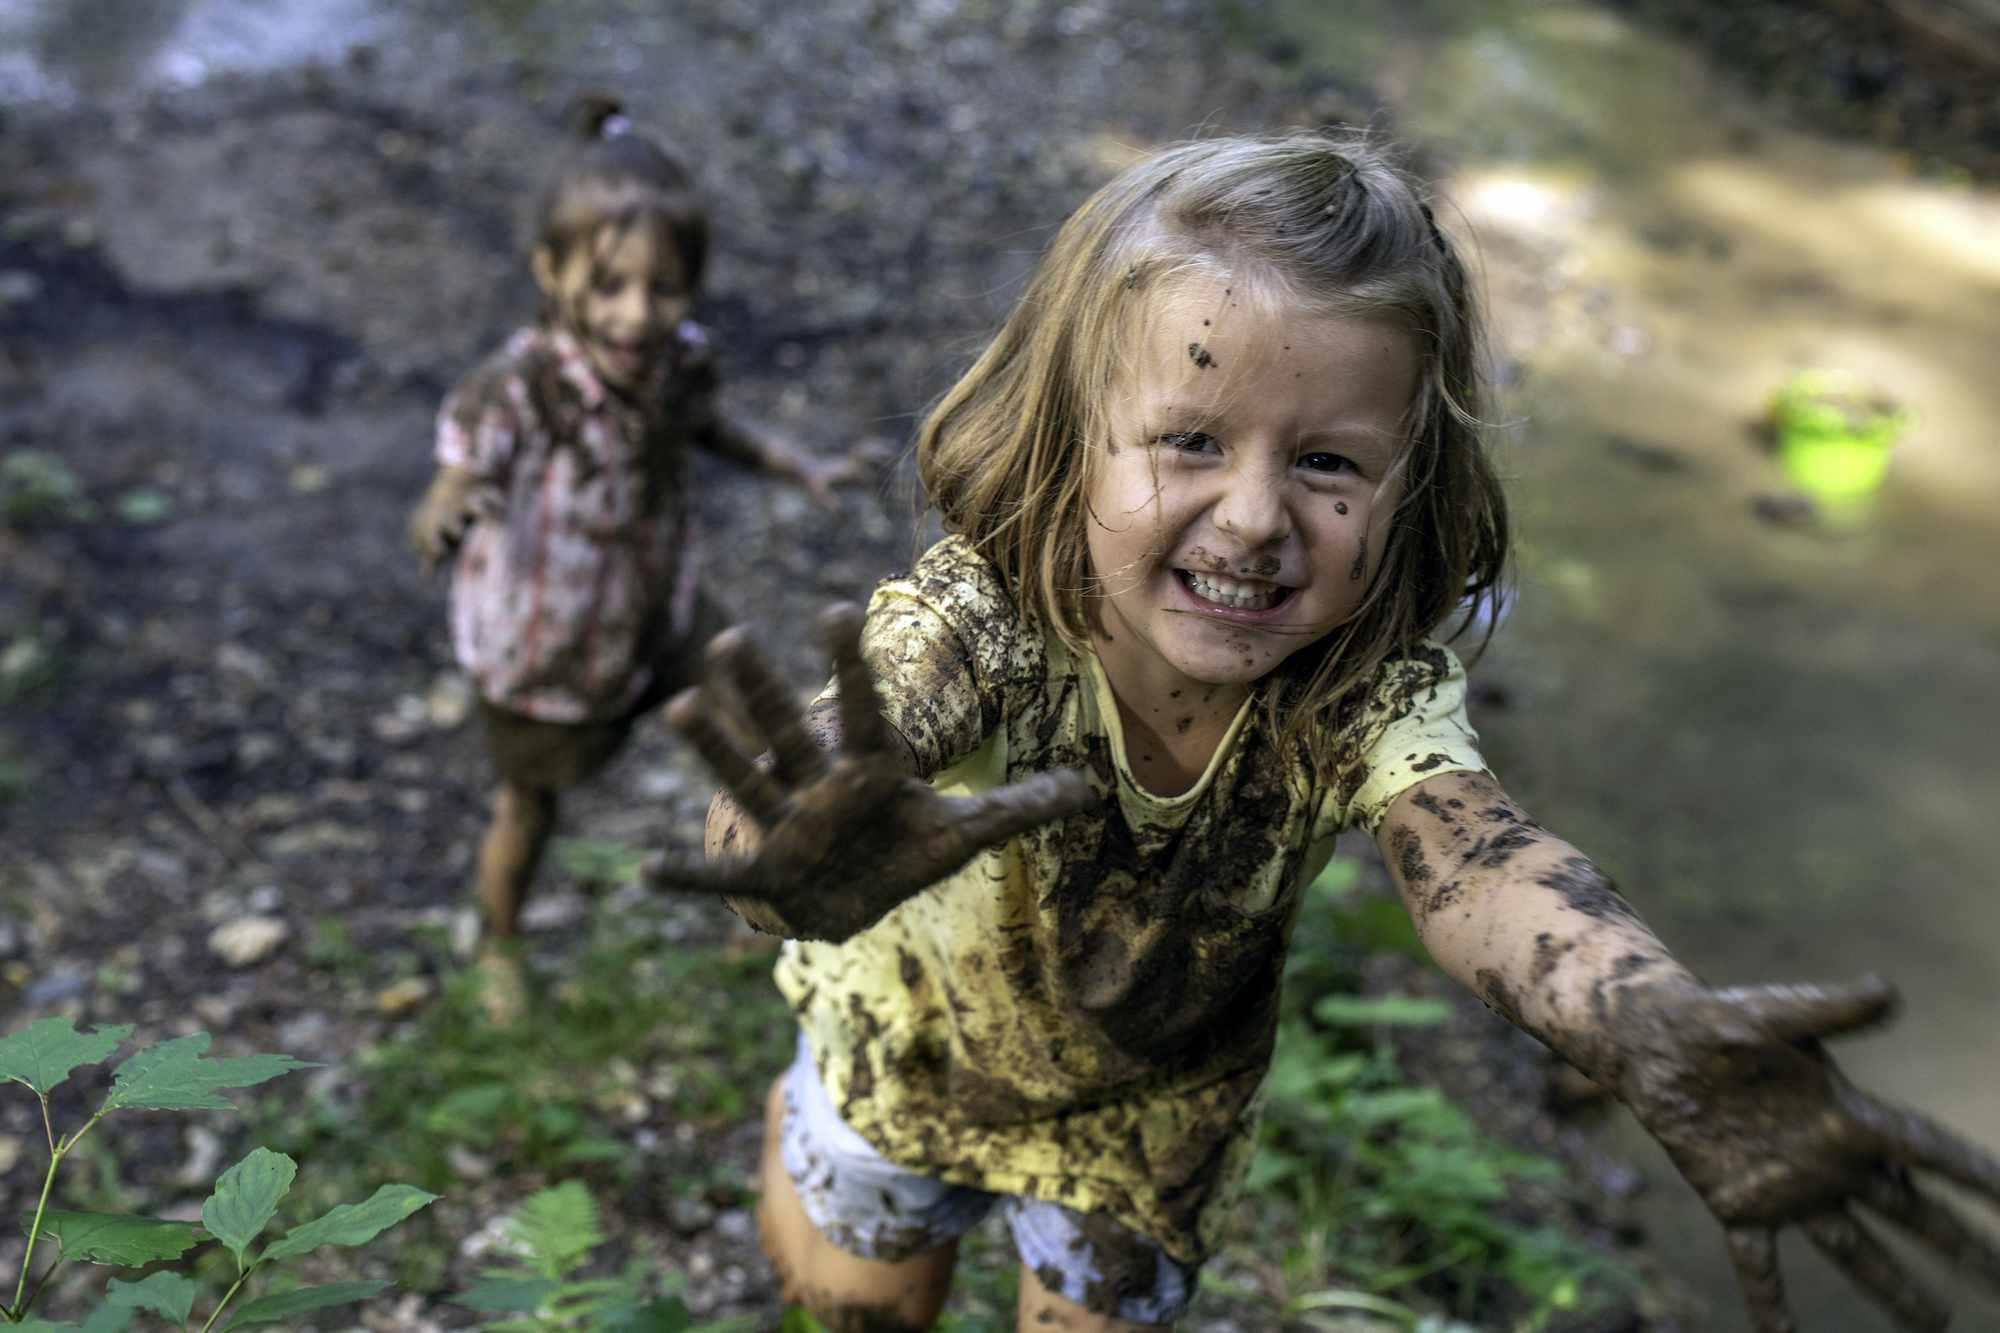 muddy little girls